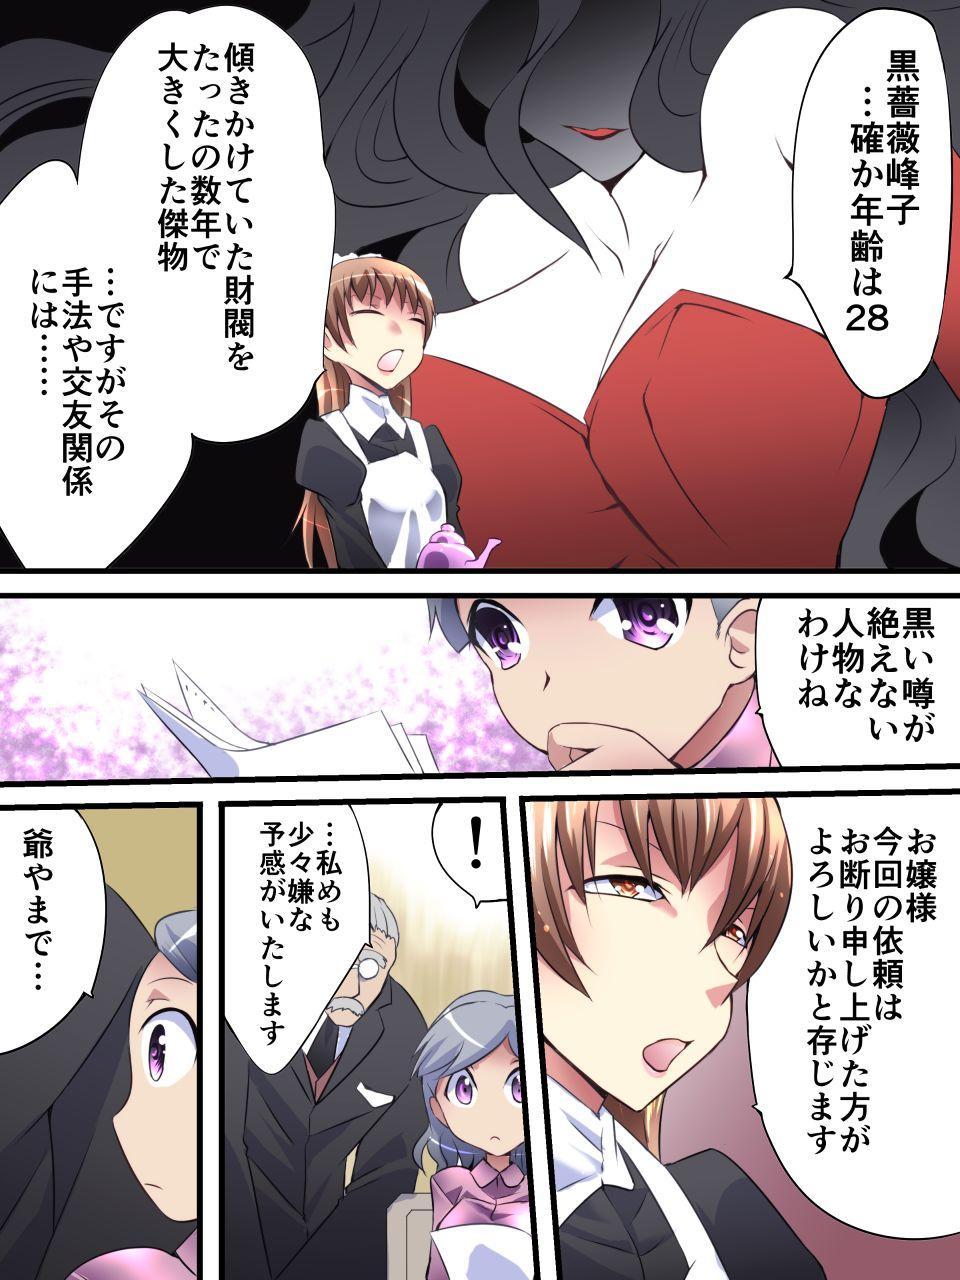 Kaitou Silver Cat Manga Ban Dai 1-wa 12